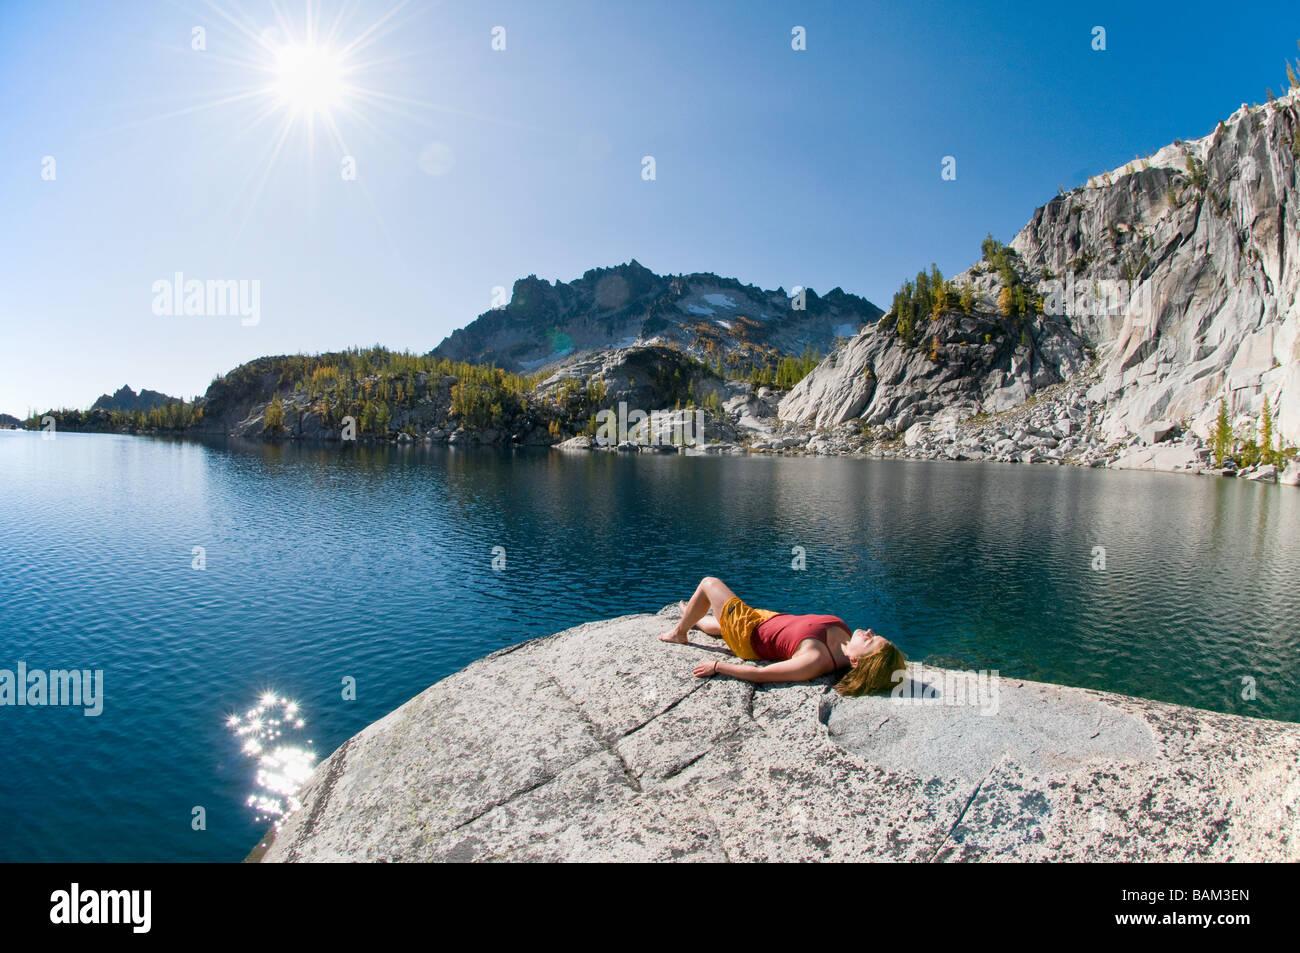 A woman sunbathing next to enchantment lakes - Stock Image